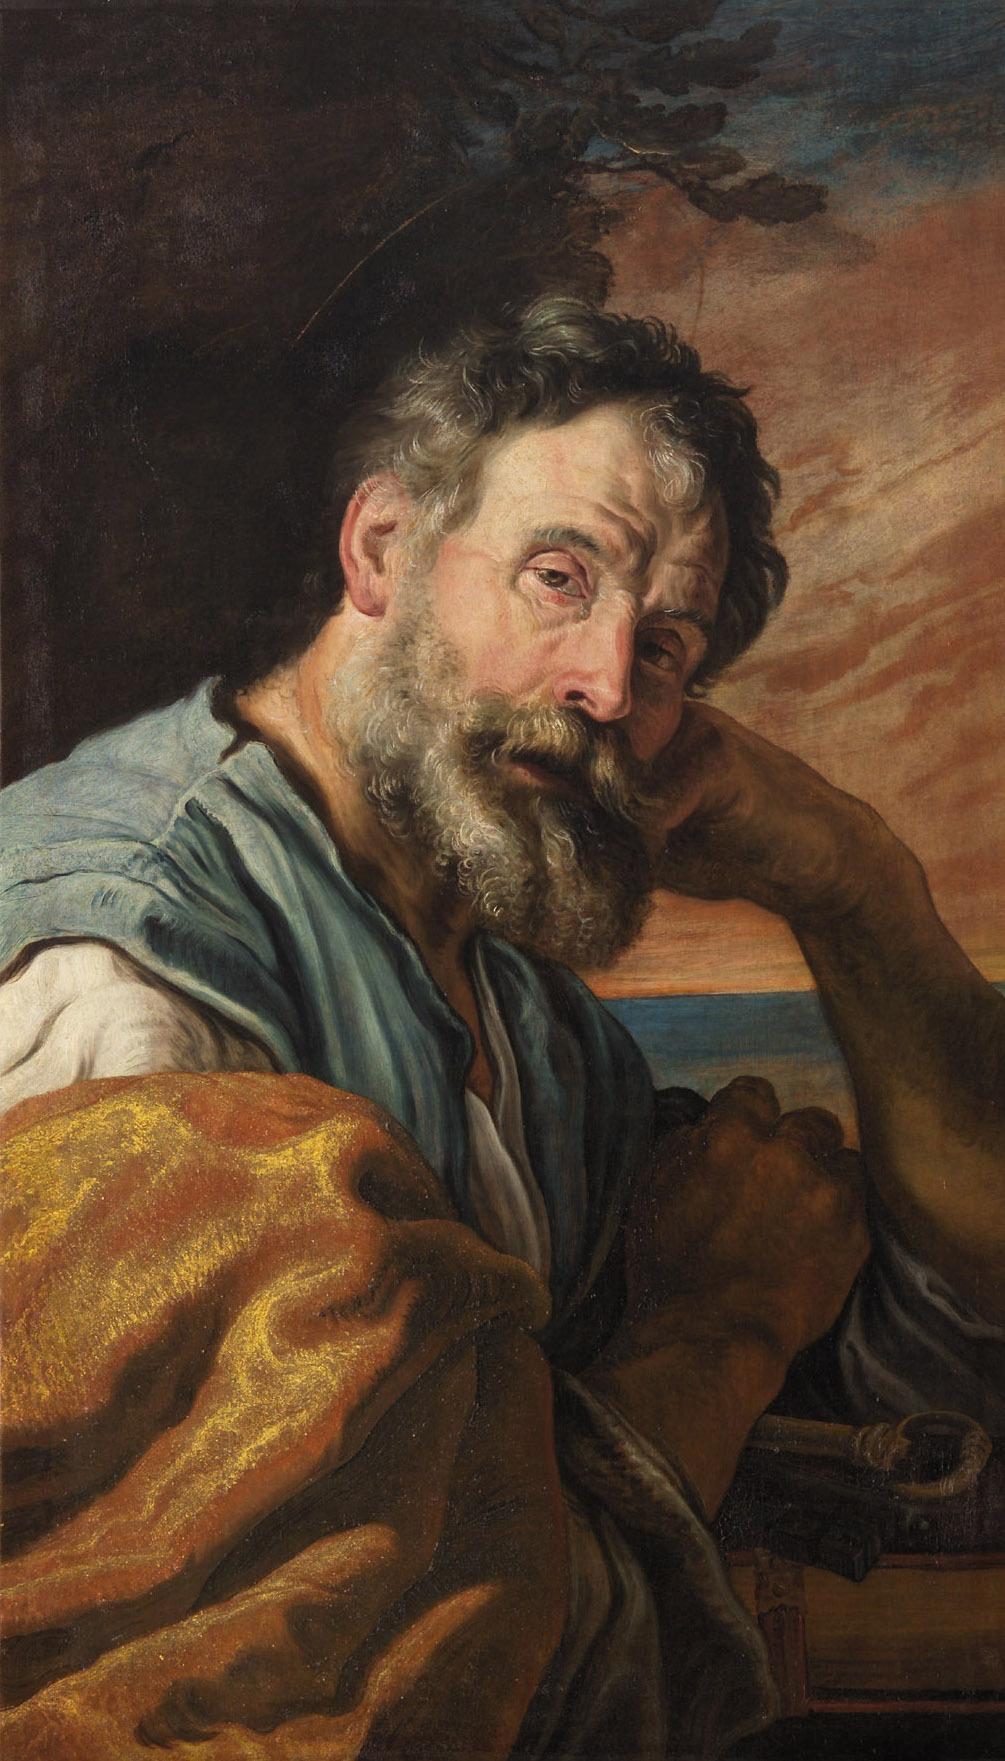 Reuiger Petrus von Domenico Fetti